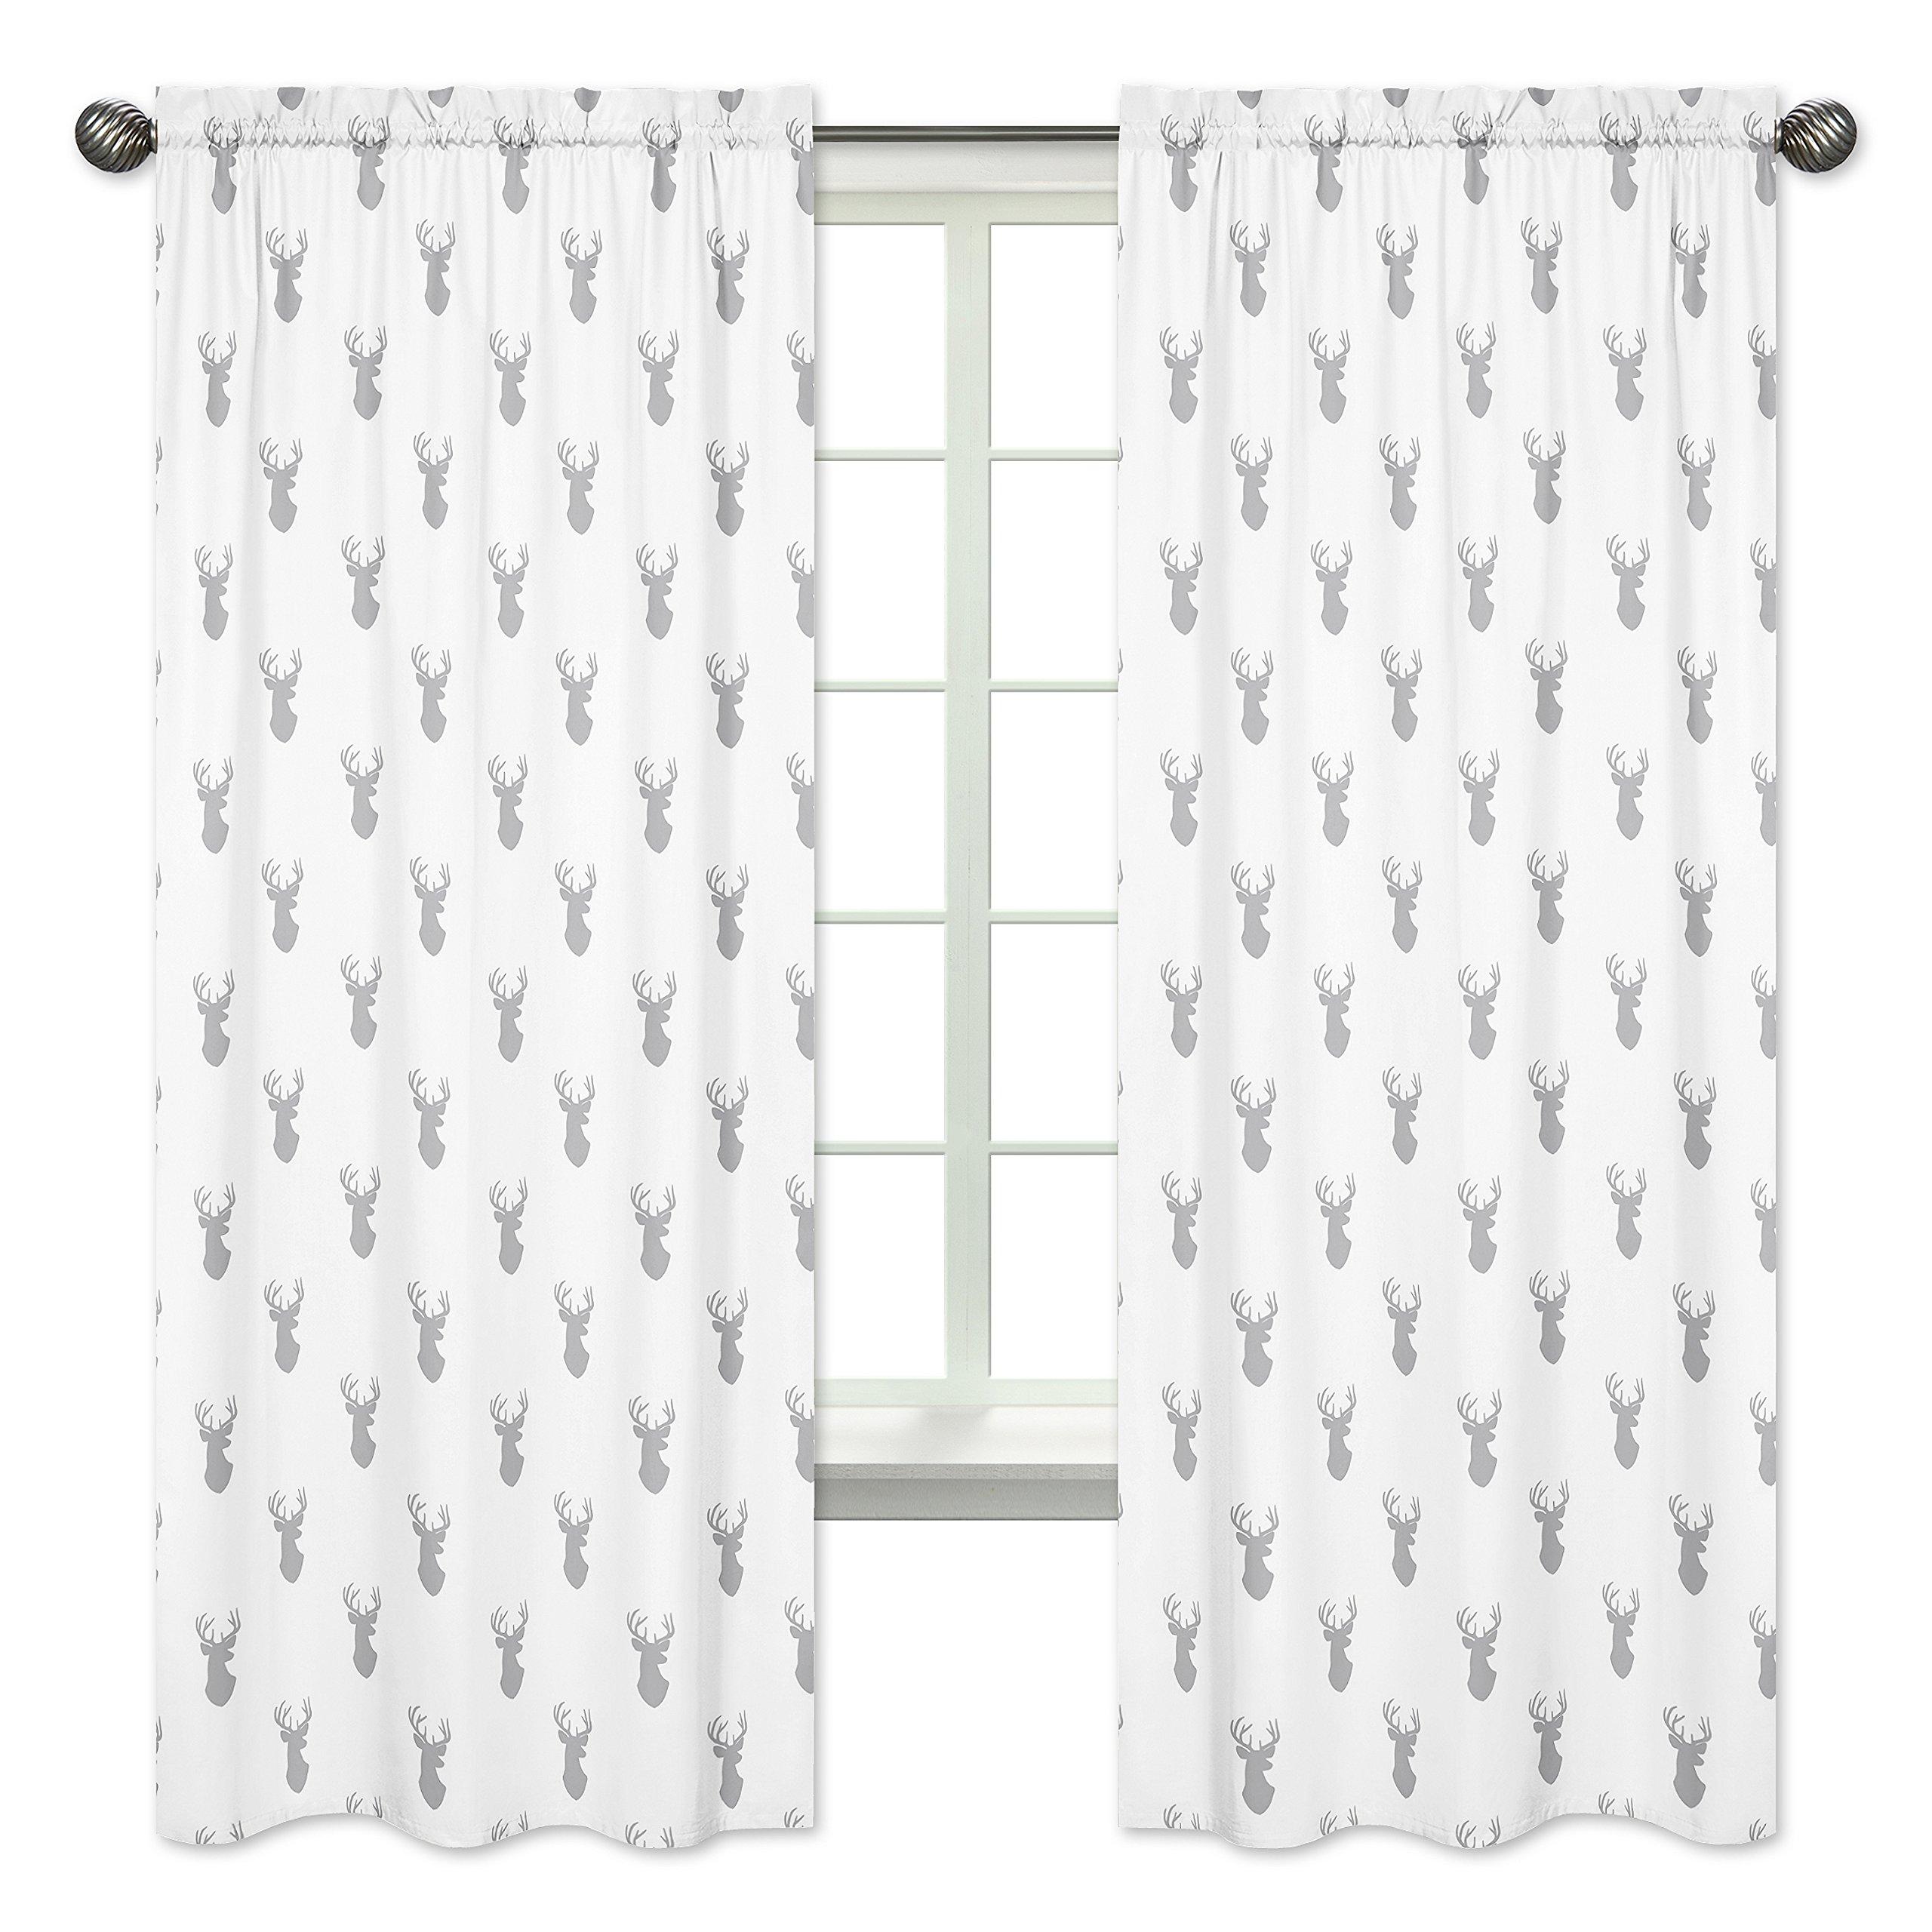 Sweet Jojo Designs 2-Piece Grey and White Woodland Deer Boys Bedroom Decor Window Treatment Panels